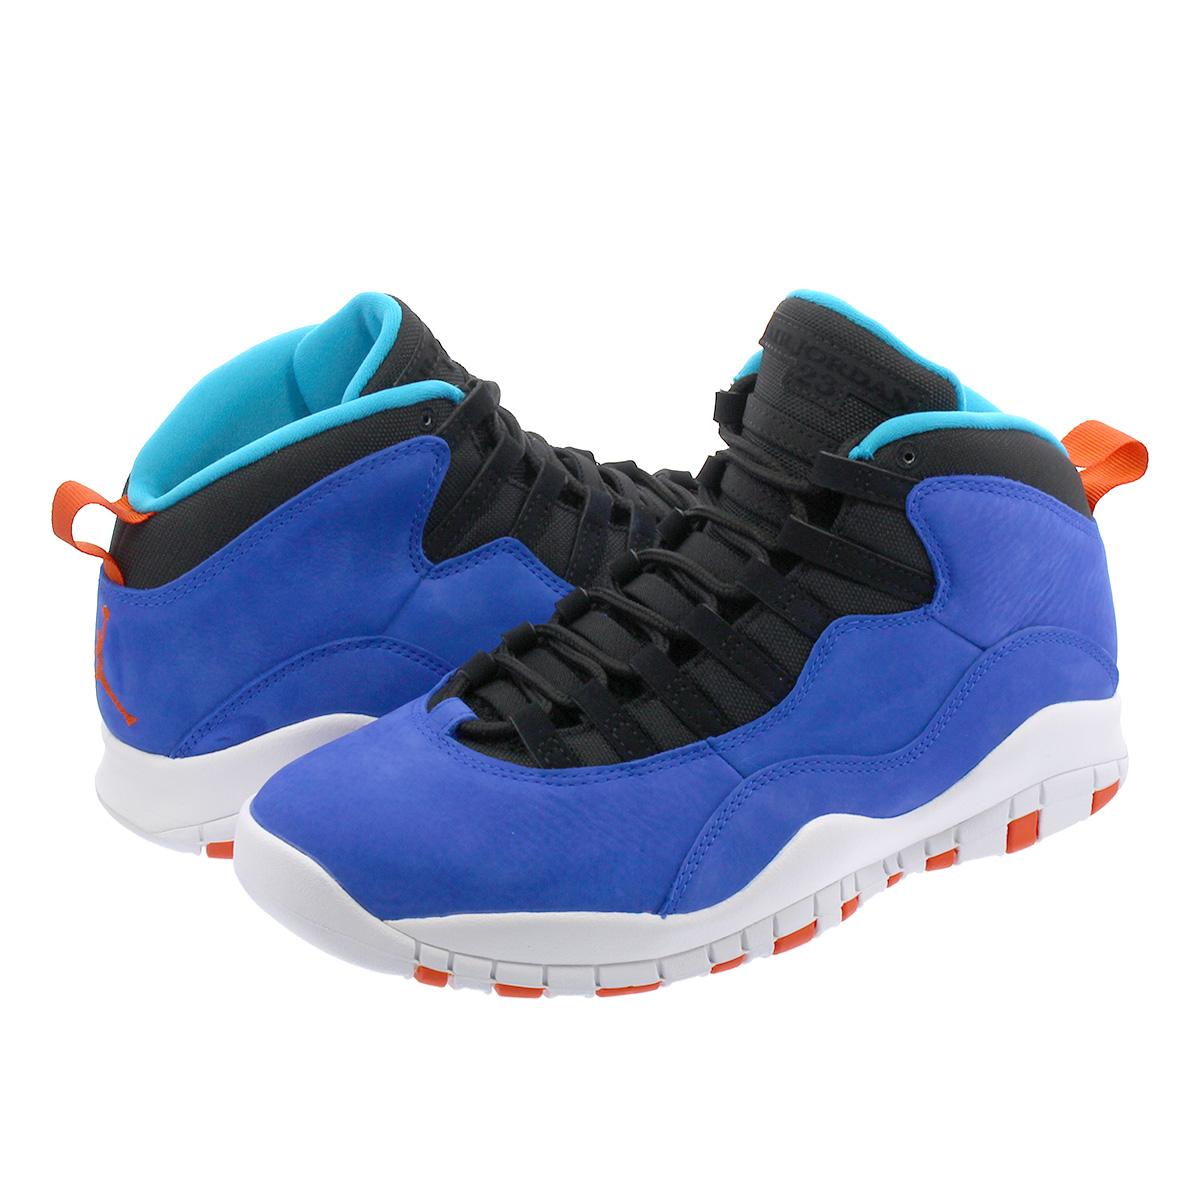 0be93e0bcb283d NIKE AIR JORDAN 10 RETRO Nike Air Jordan 10 nostalgic RACER BLUE BLACK TEAM  ORANGE WHITE 310